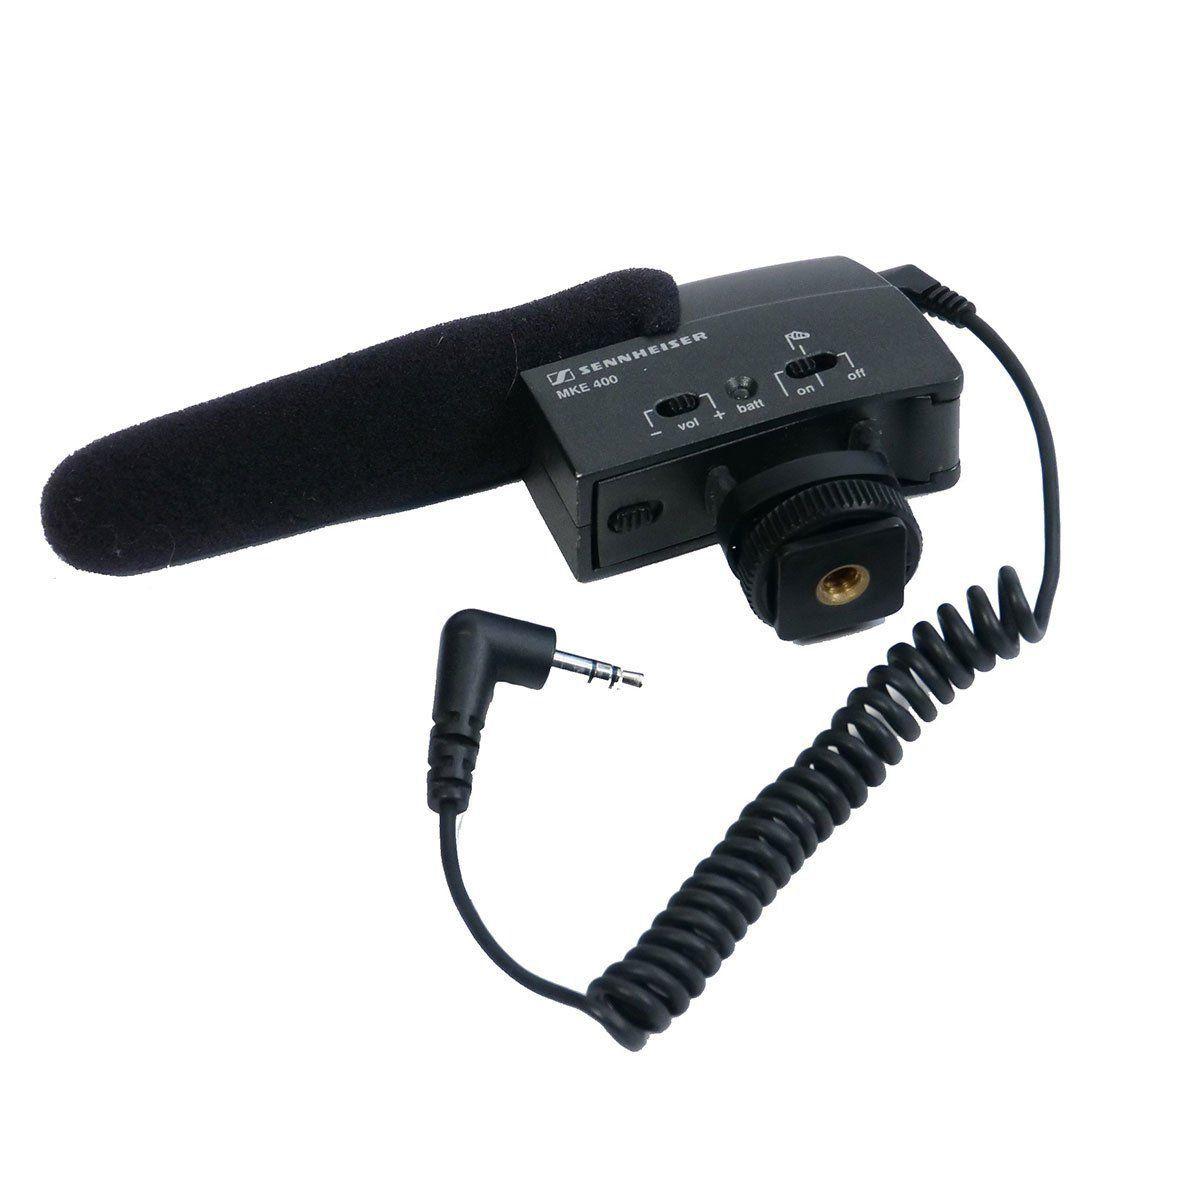 Sennheiser MKE 400 Microfone Shotgun MKE400 Captura de Sons Sem Ruídos